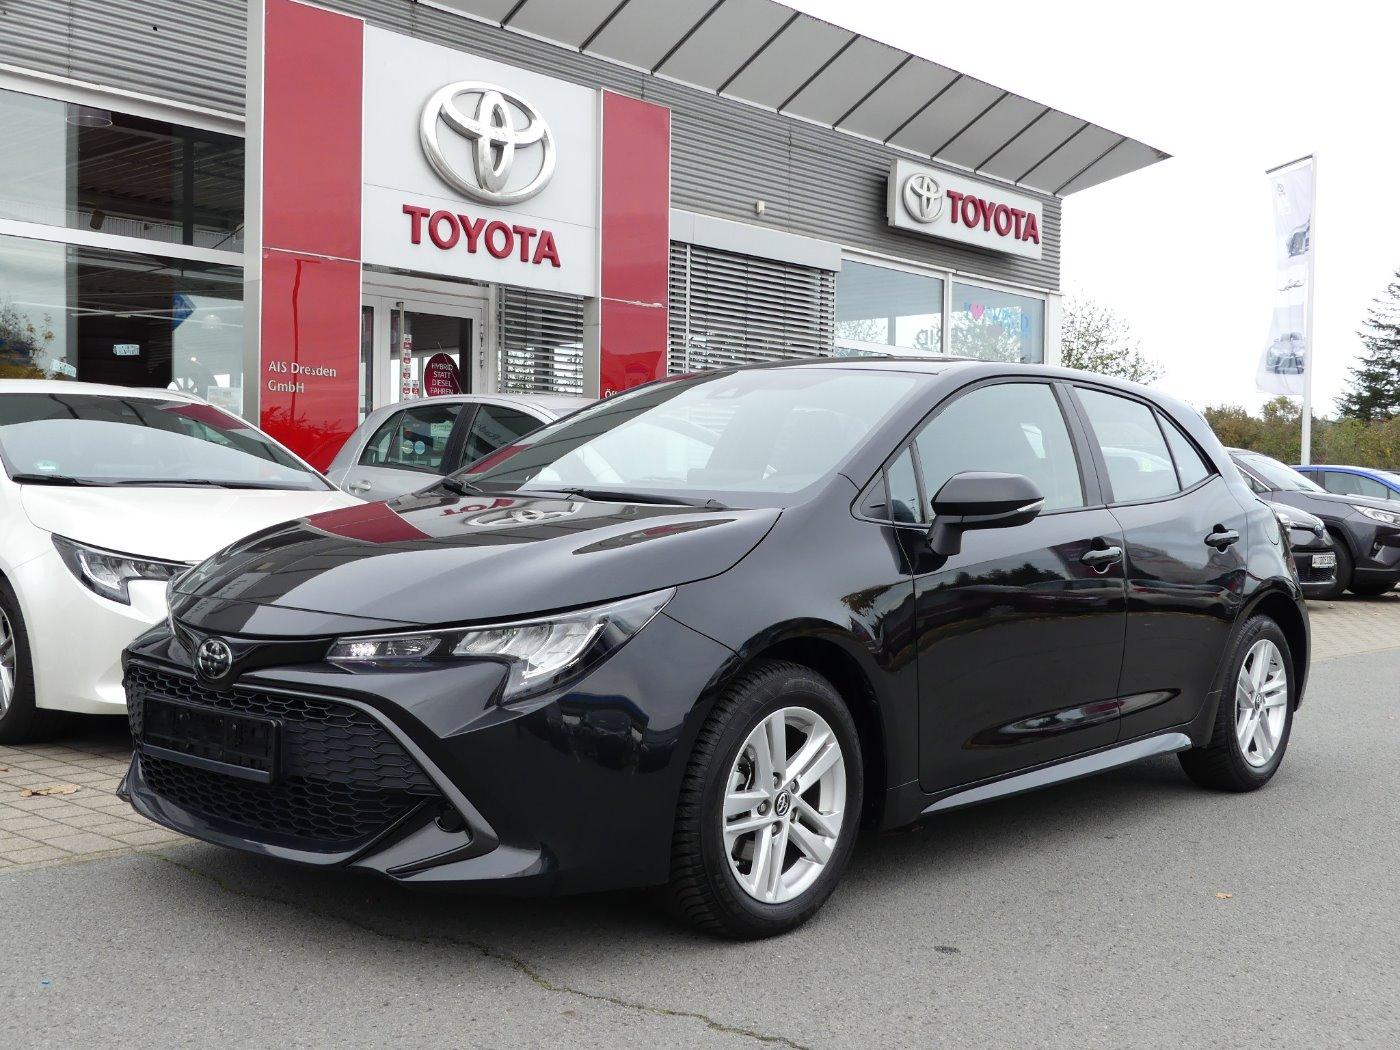 Toyota Corolla 1.2T Comfort Heizbares Lenkrad*Navi, Jahr 2019, Benzin